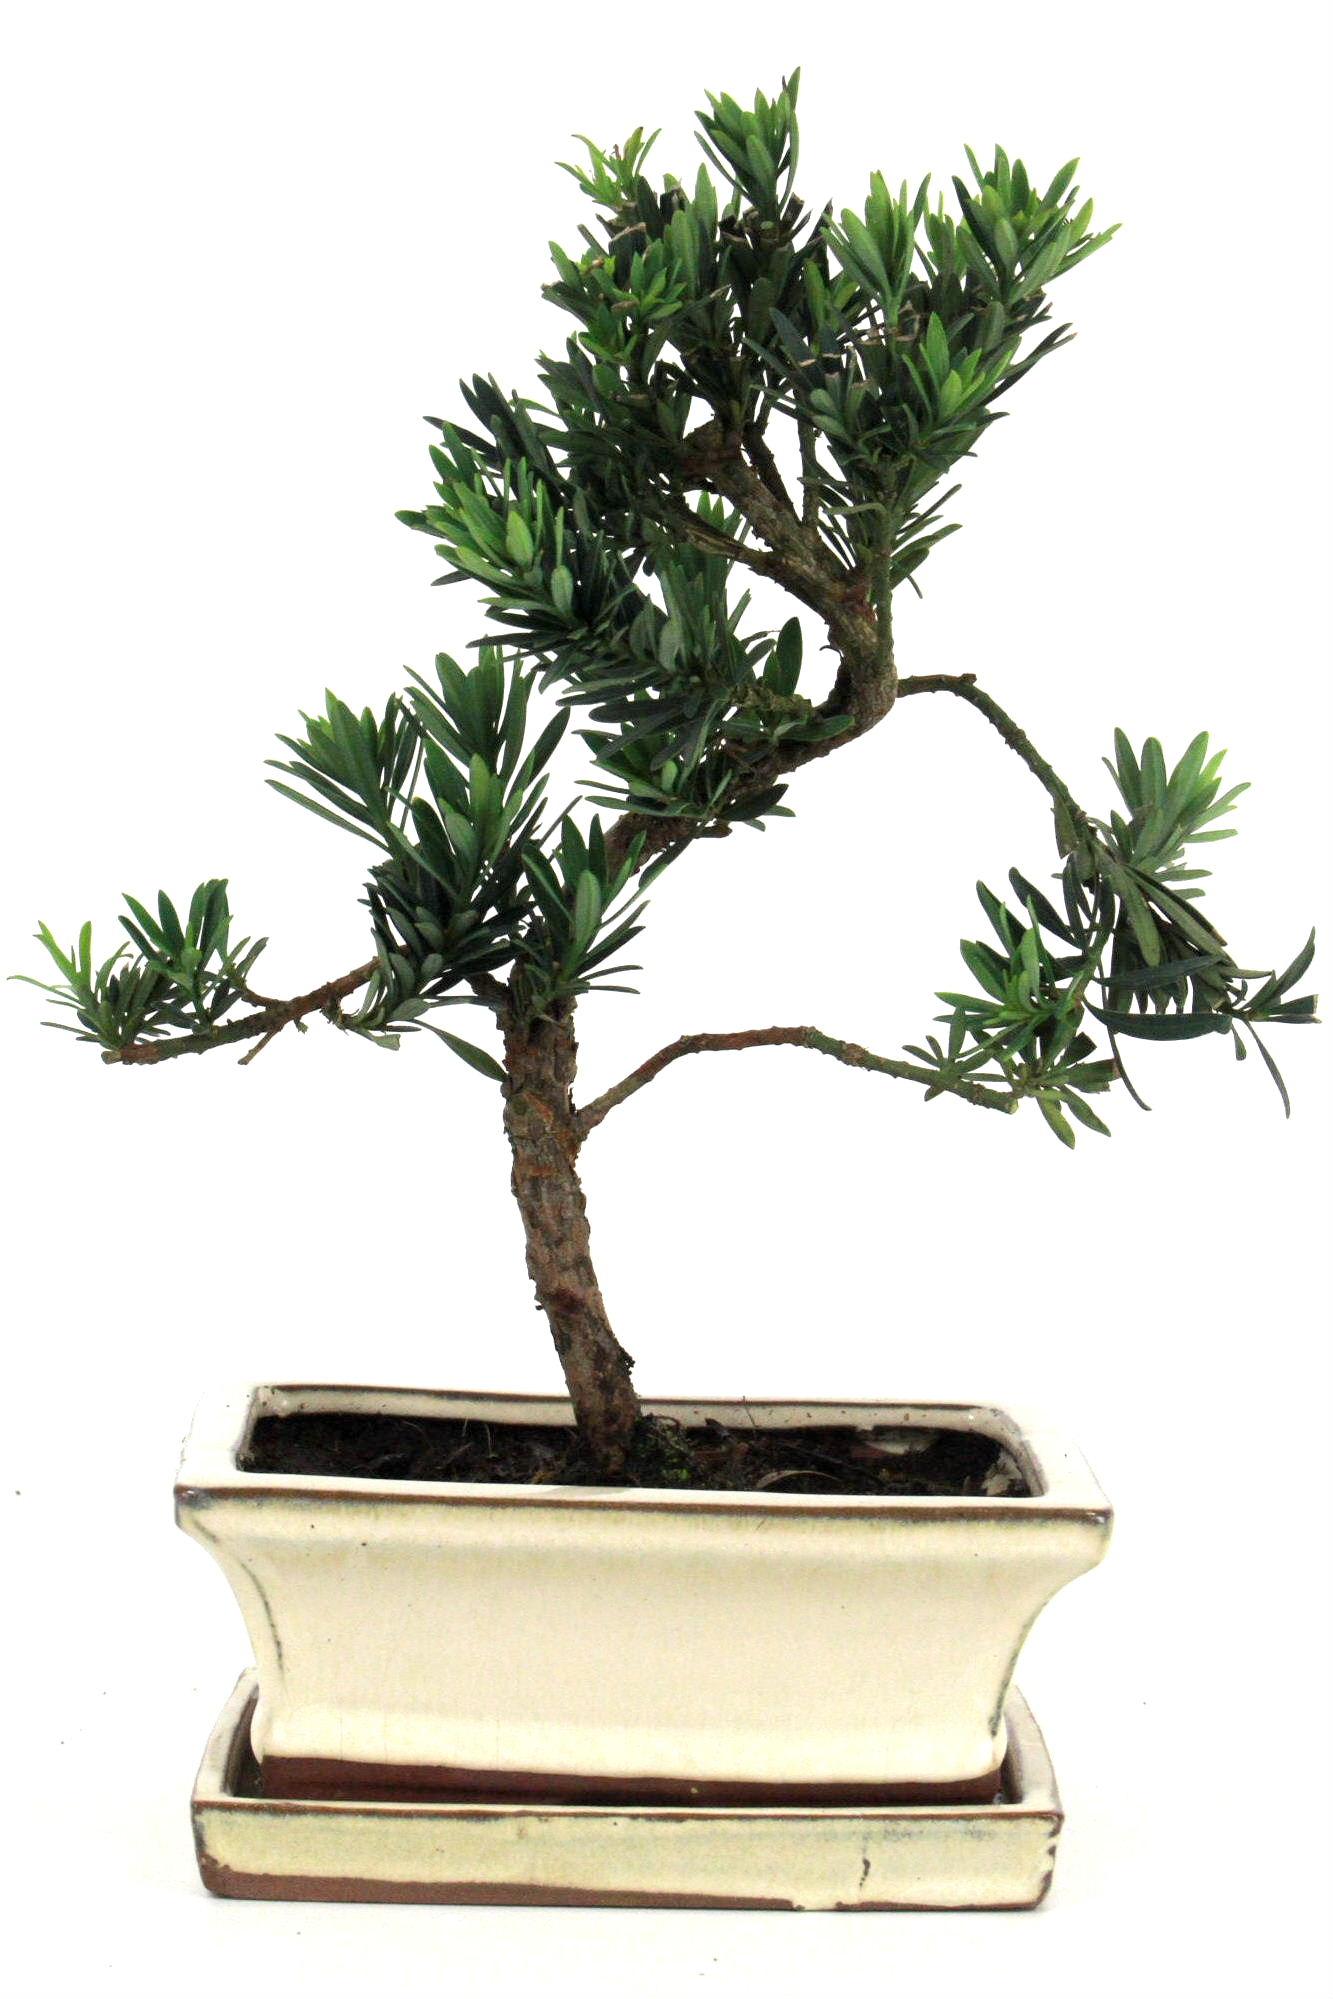 steineibe bonsai 30 35 cm 1617 bei oyaki bonsai kaufen. Black Bedroom Furniture Sets. Home Design Ideas